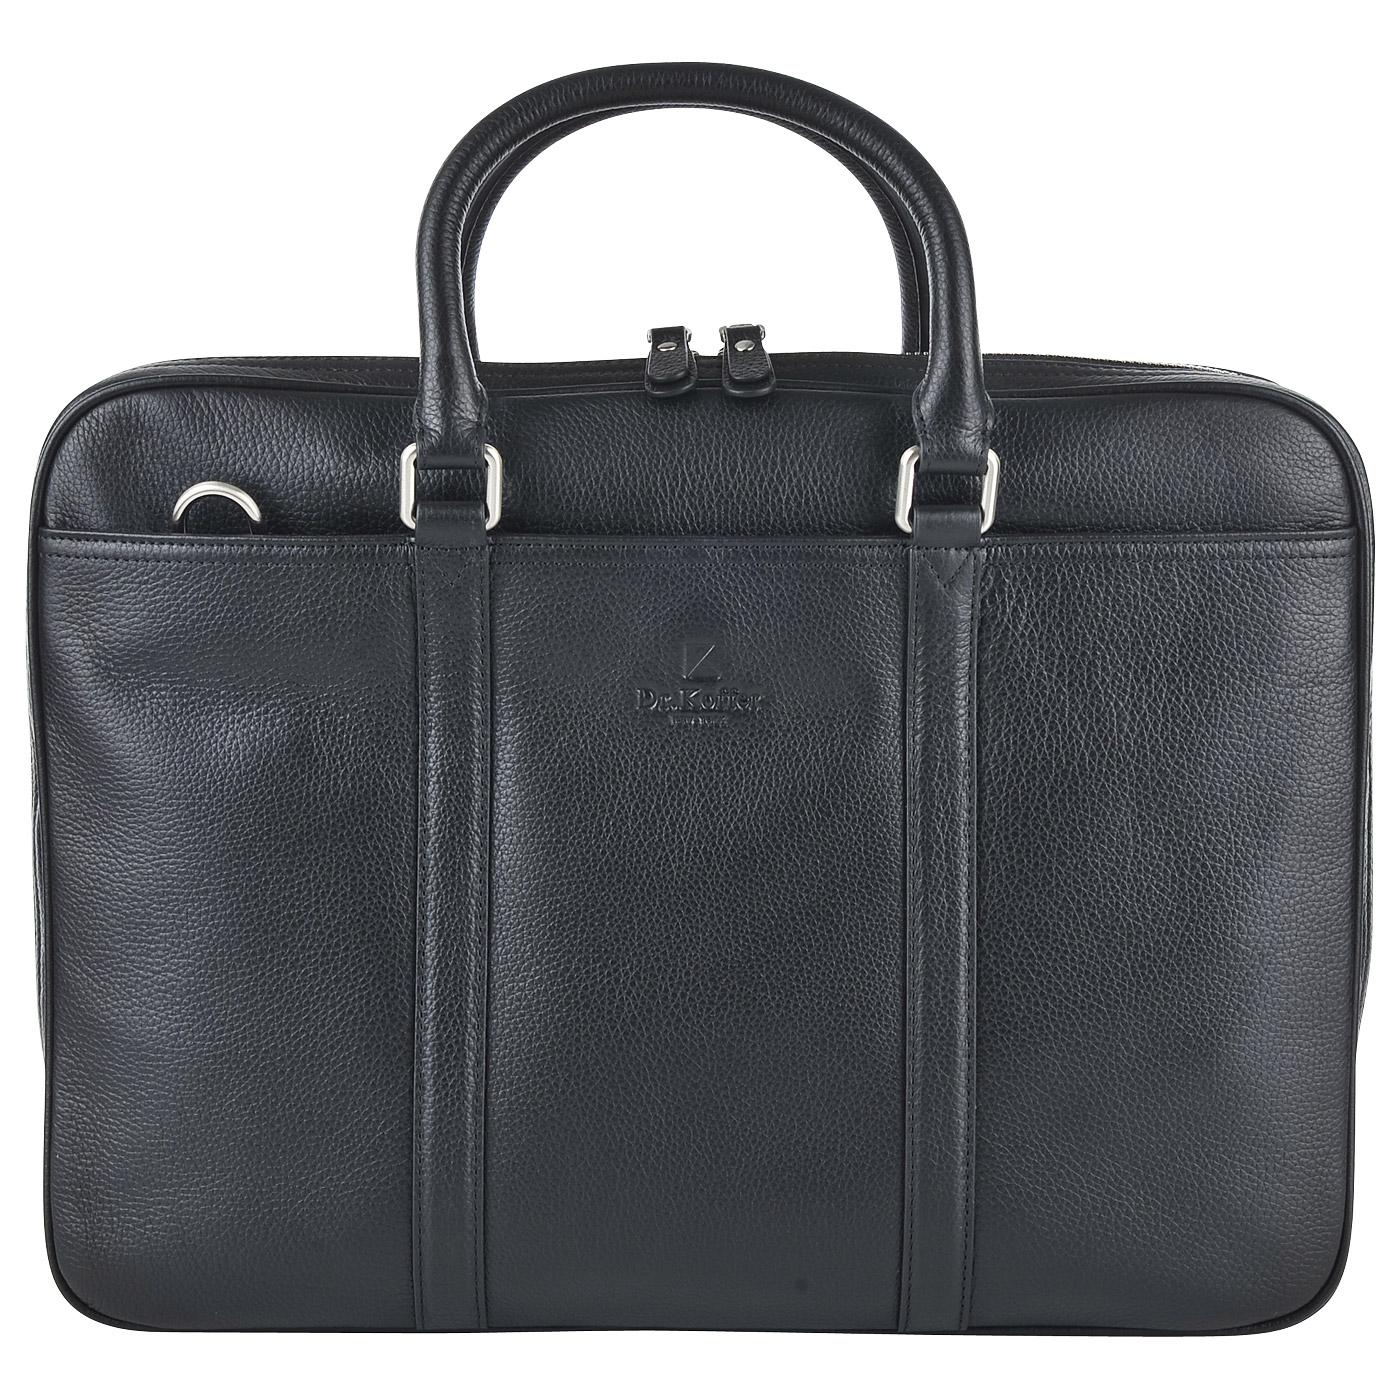 7462ac561357 Мужская кожаная сумка для документов Dr. Koffer B402619-220-04 ...